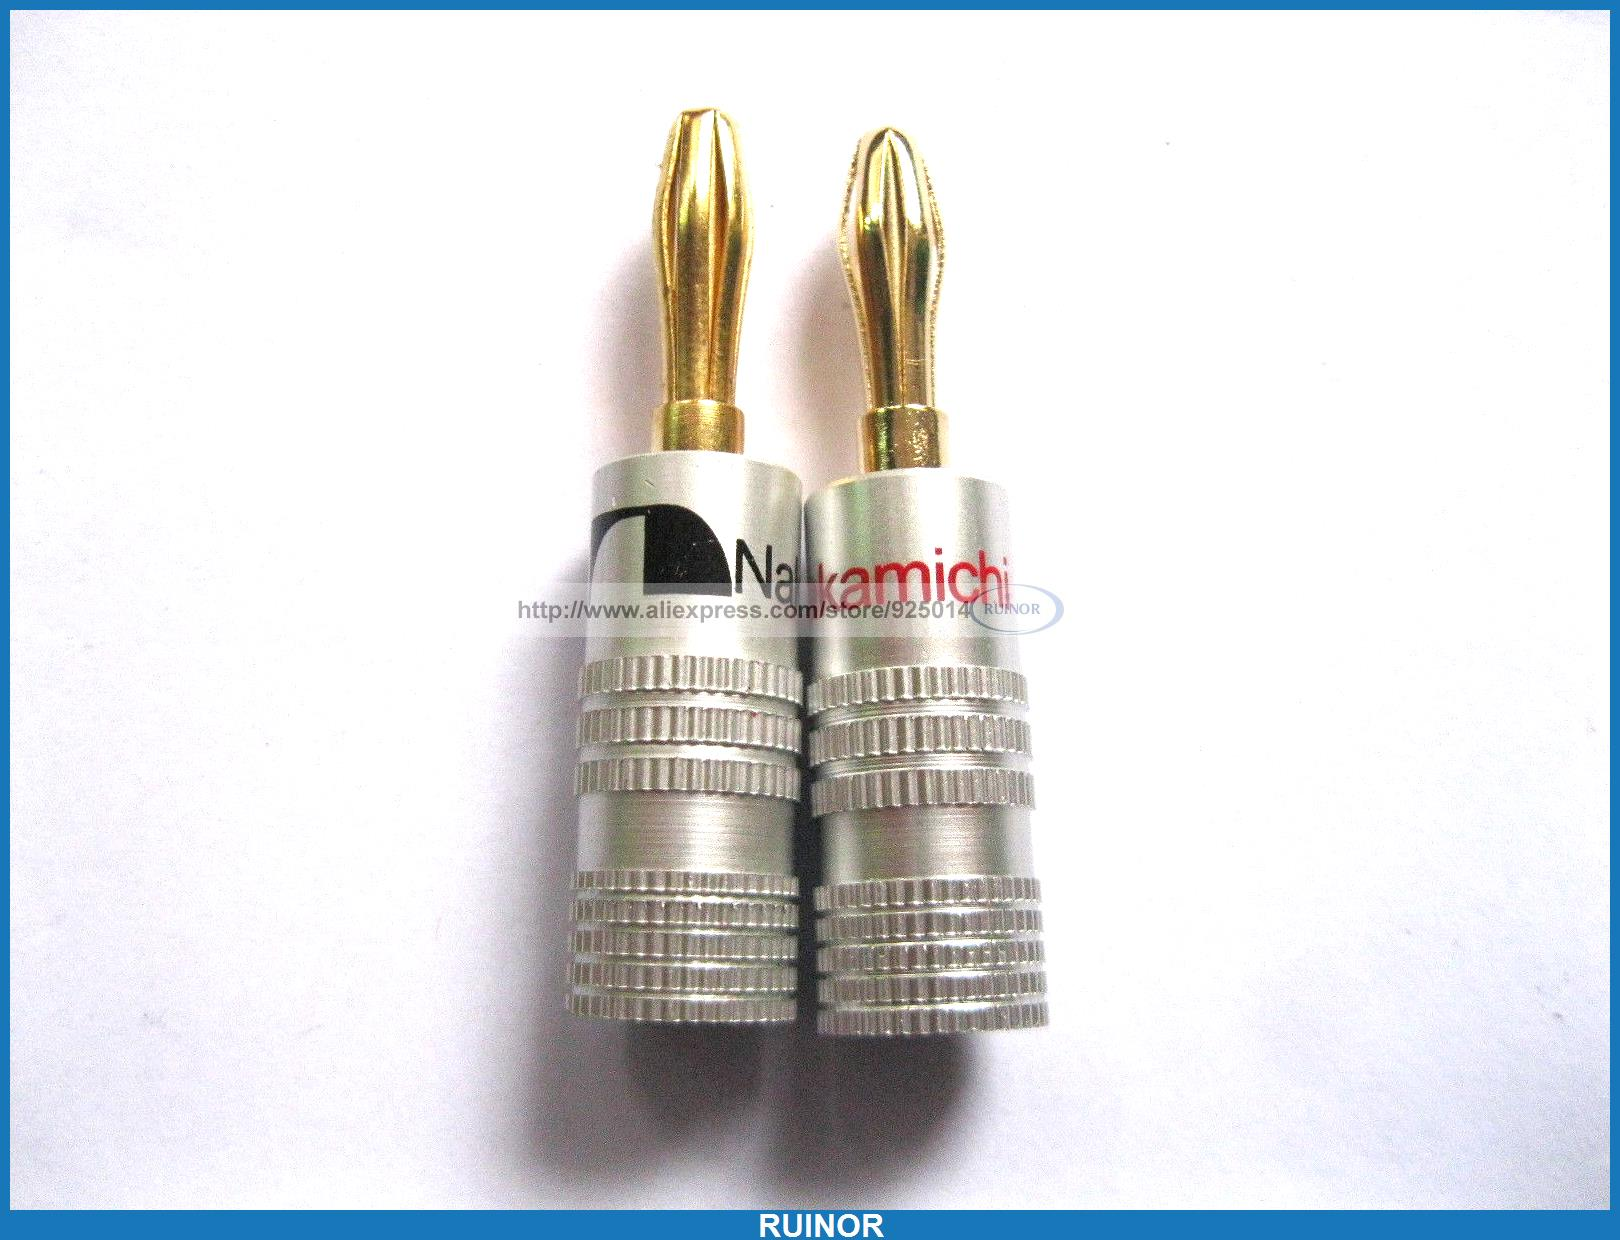 10 Pcs Nakamichi Gold Plated Speaker Banana Plug Connector <br><br>Aliexpress